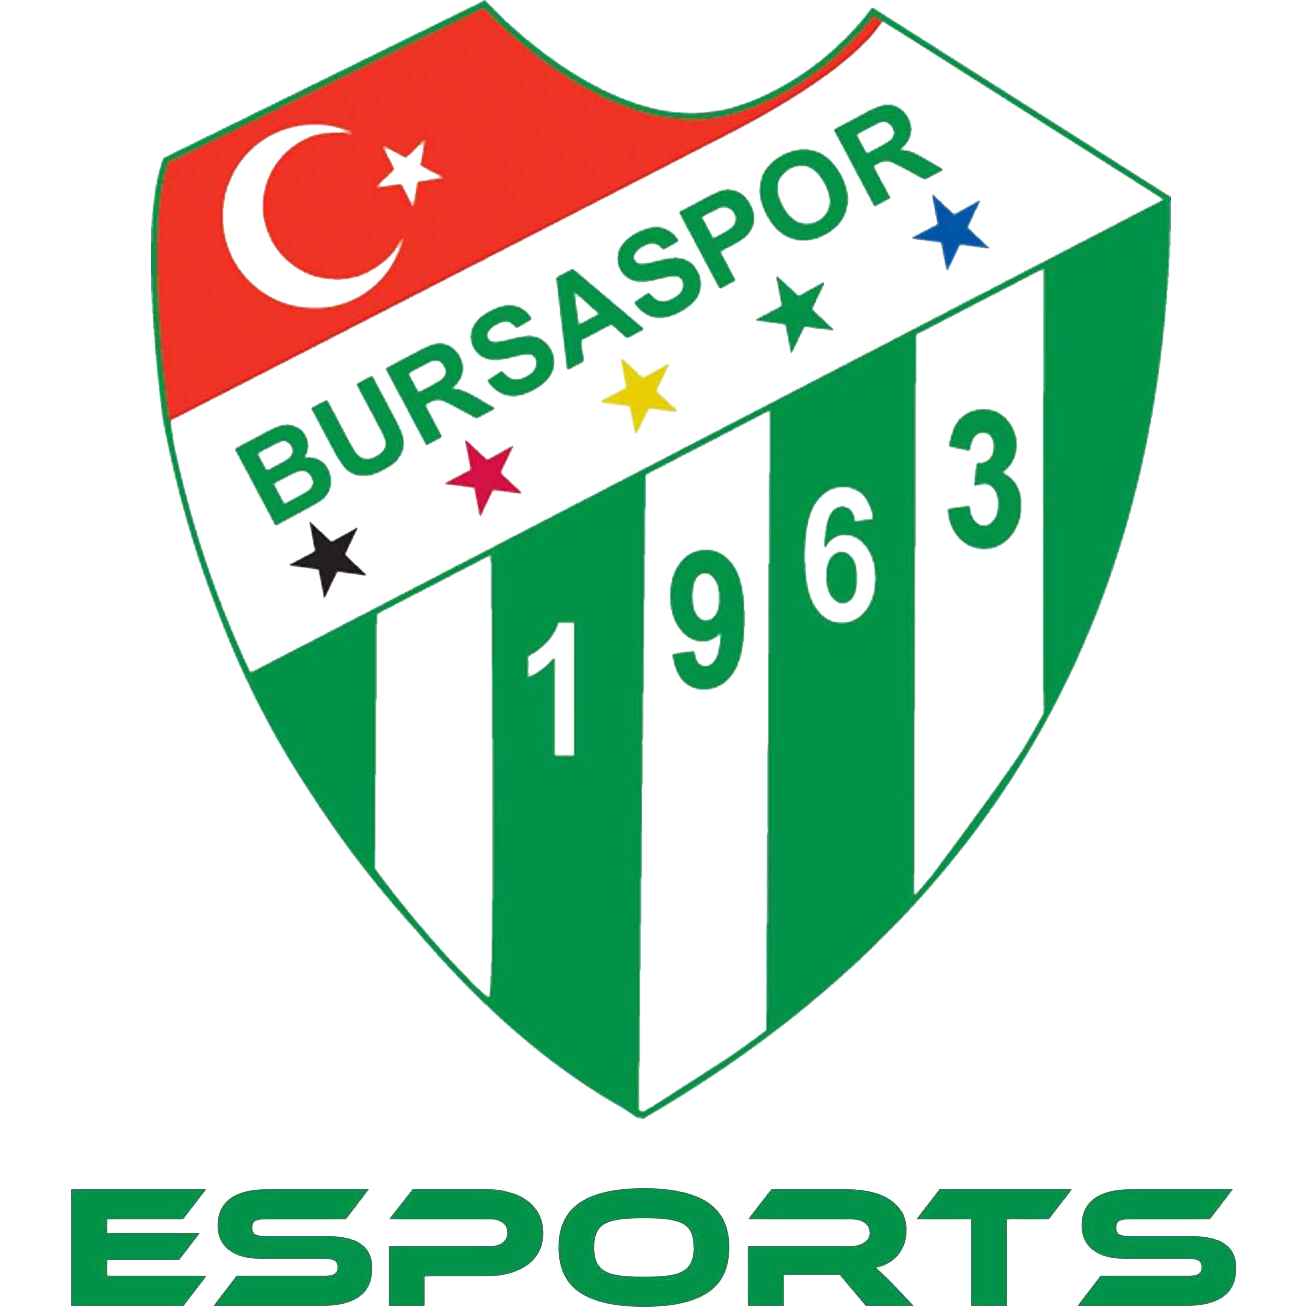 Bursaspor Esports League of Legends